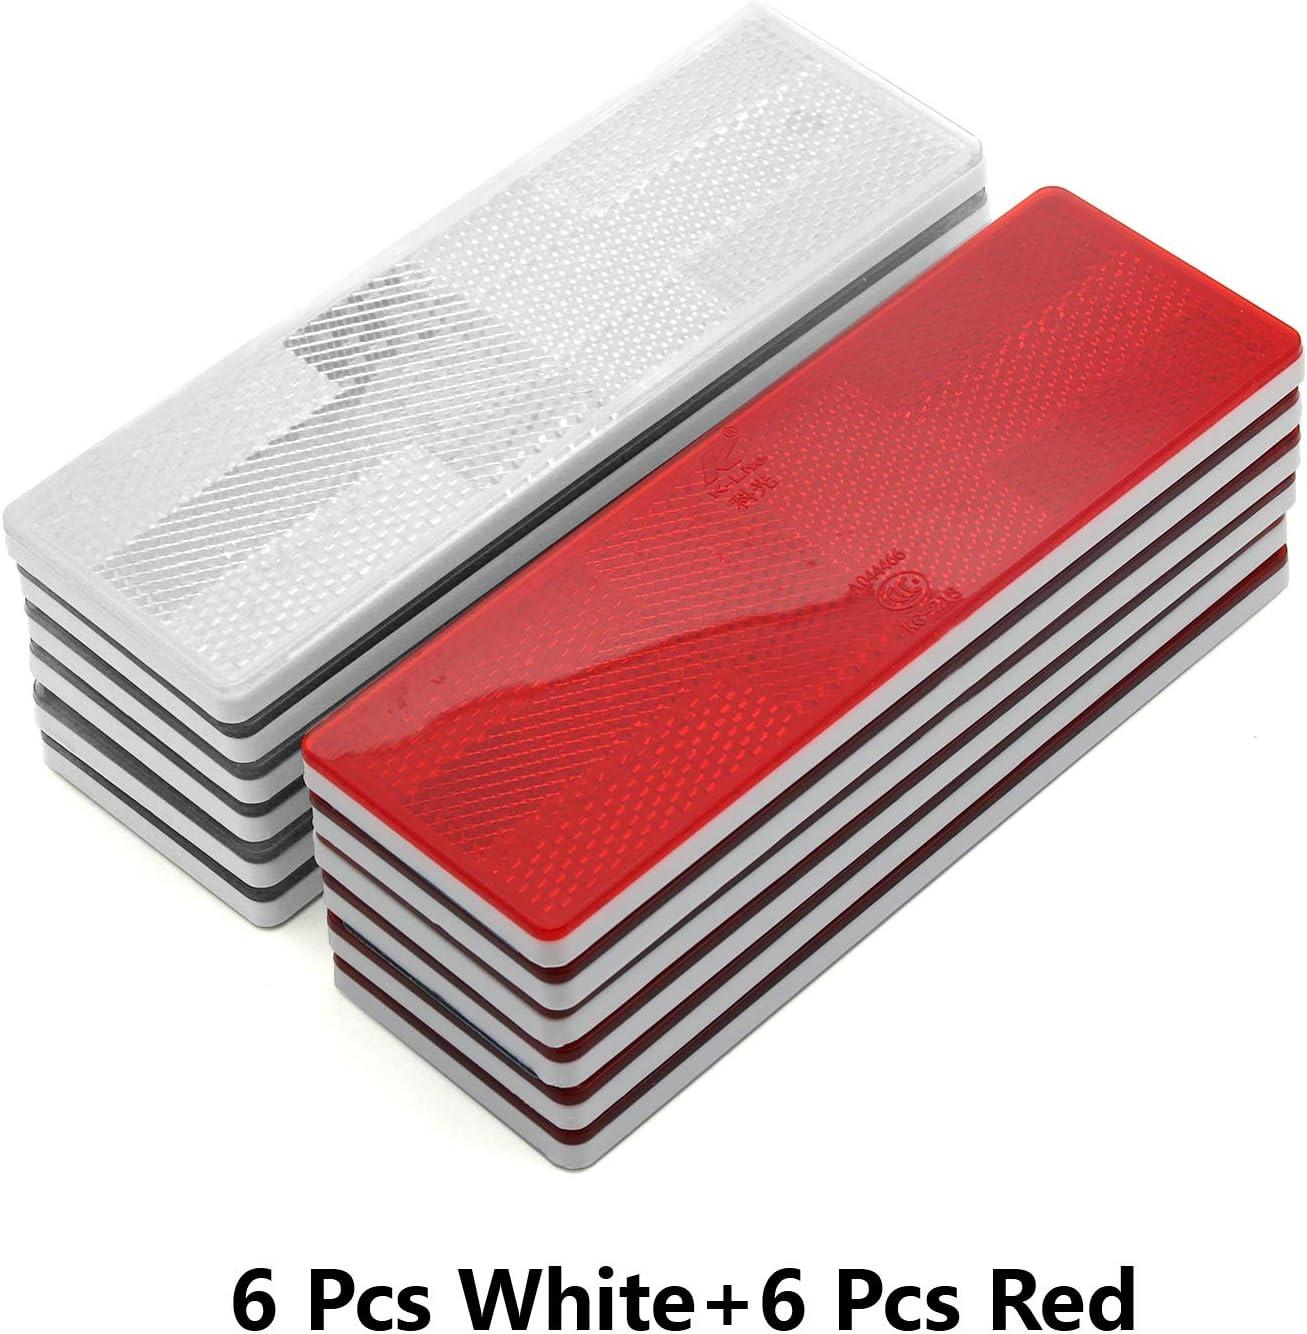 6pcs White + 6pcs Red BSK 6 Rectangular Stick-on Reflectors